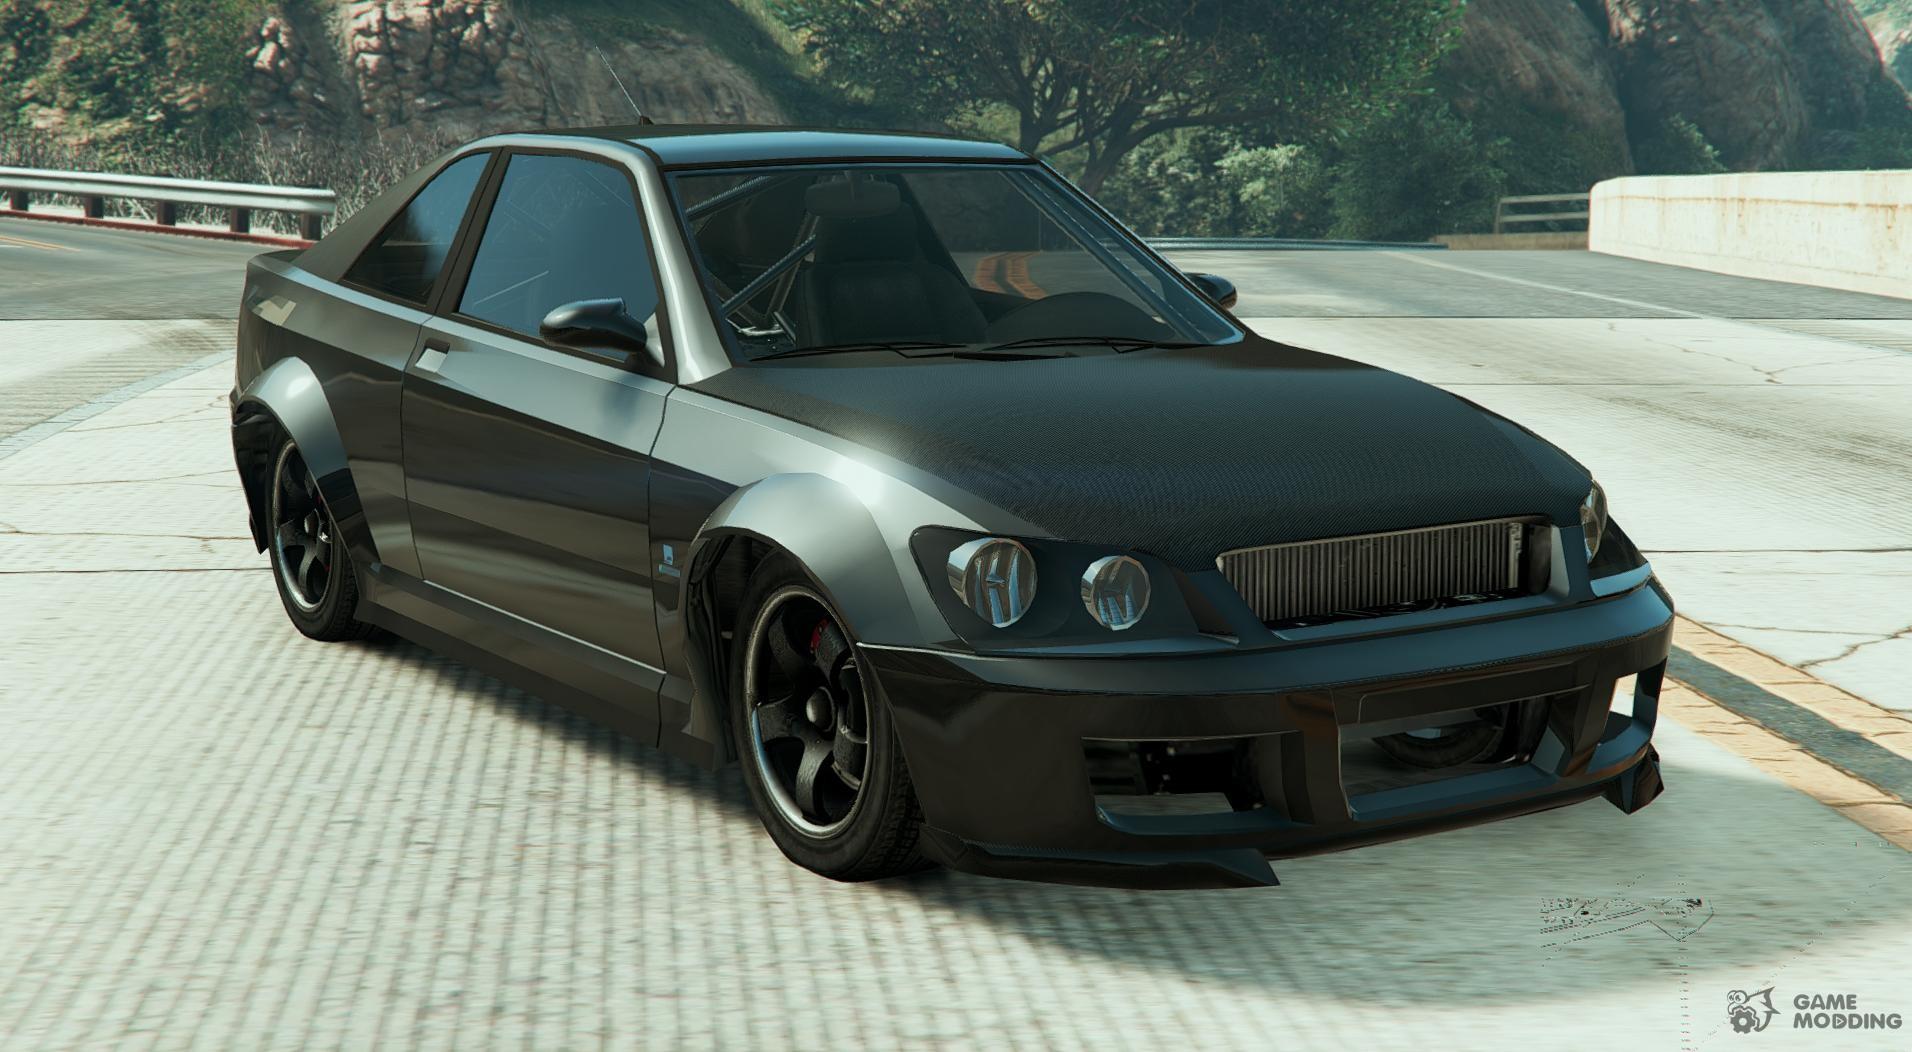 [ Car ] Sultan RS from GTA IV (Enhanced)